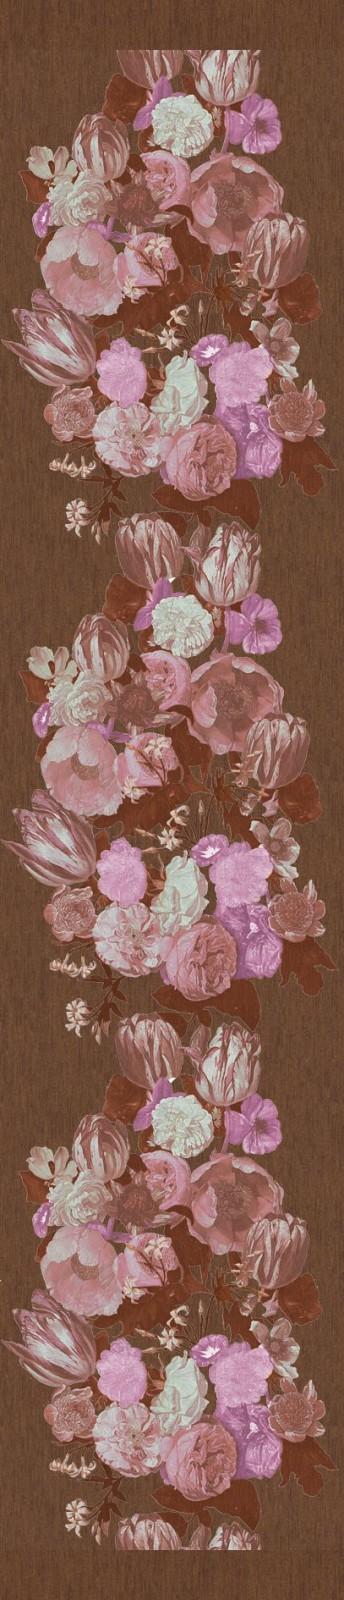 Marburg Tapeten Cuvee Prestige : Marburg 320 x 70 cm Panel 54974 Floral braun metallic